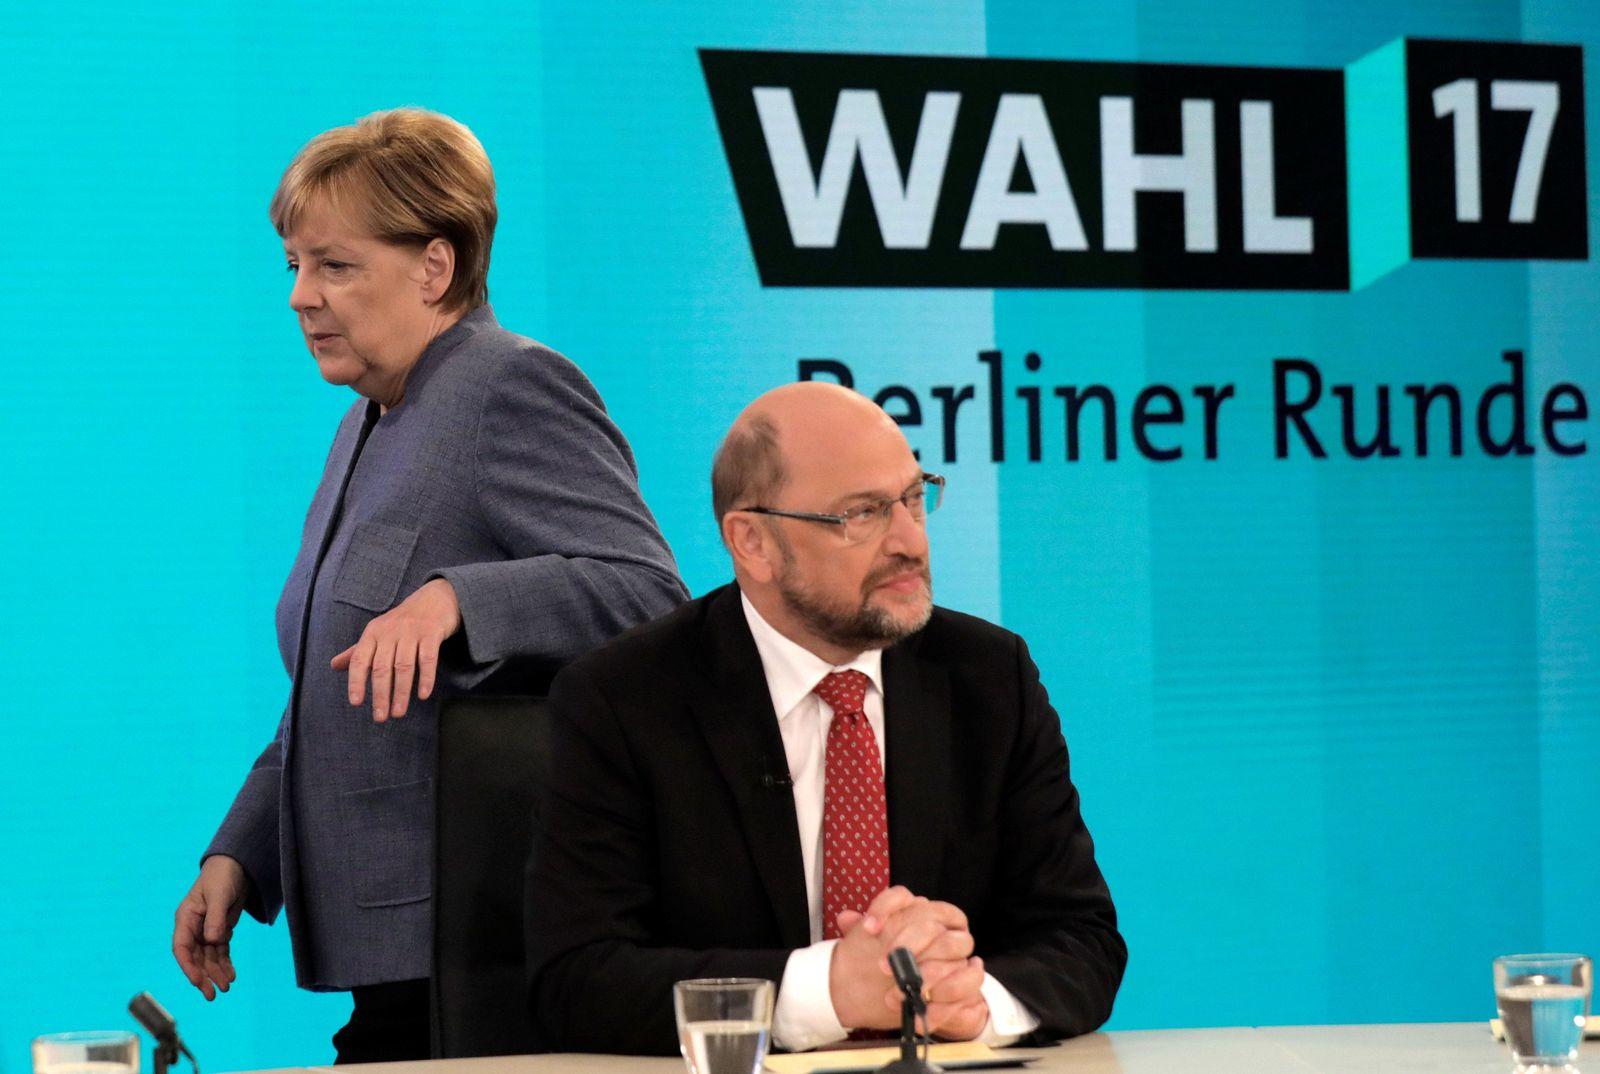 Angela Merkel/Martin Schulz